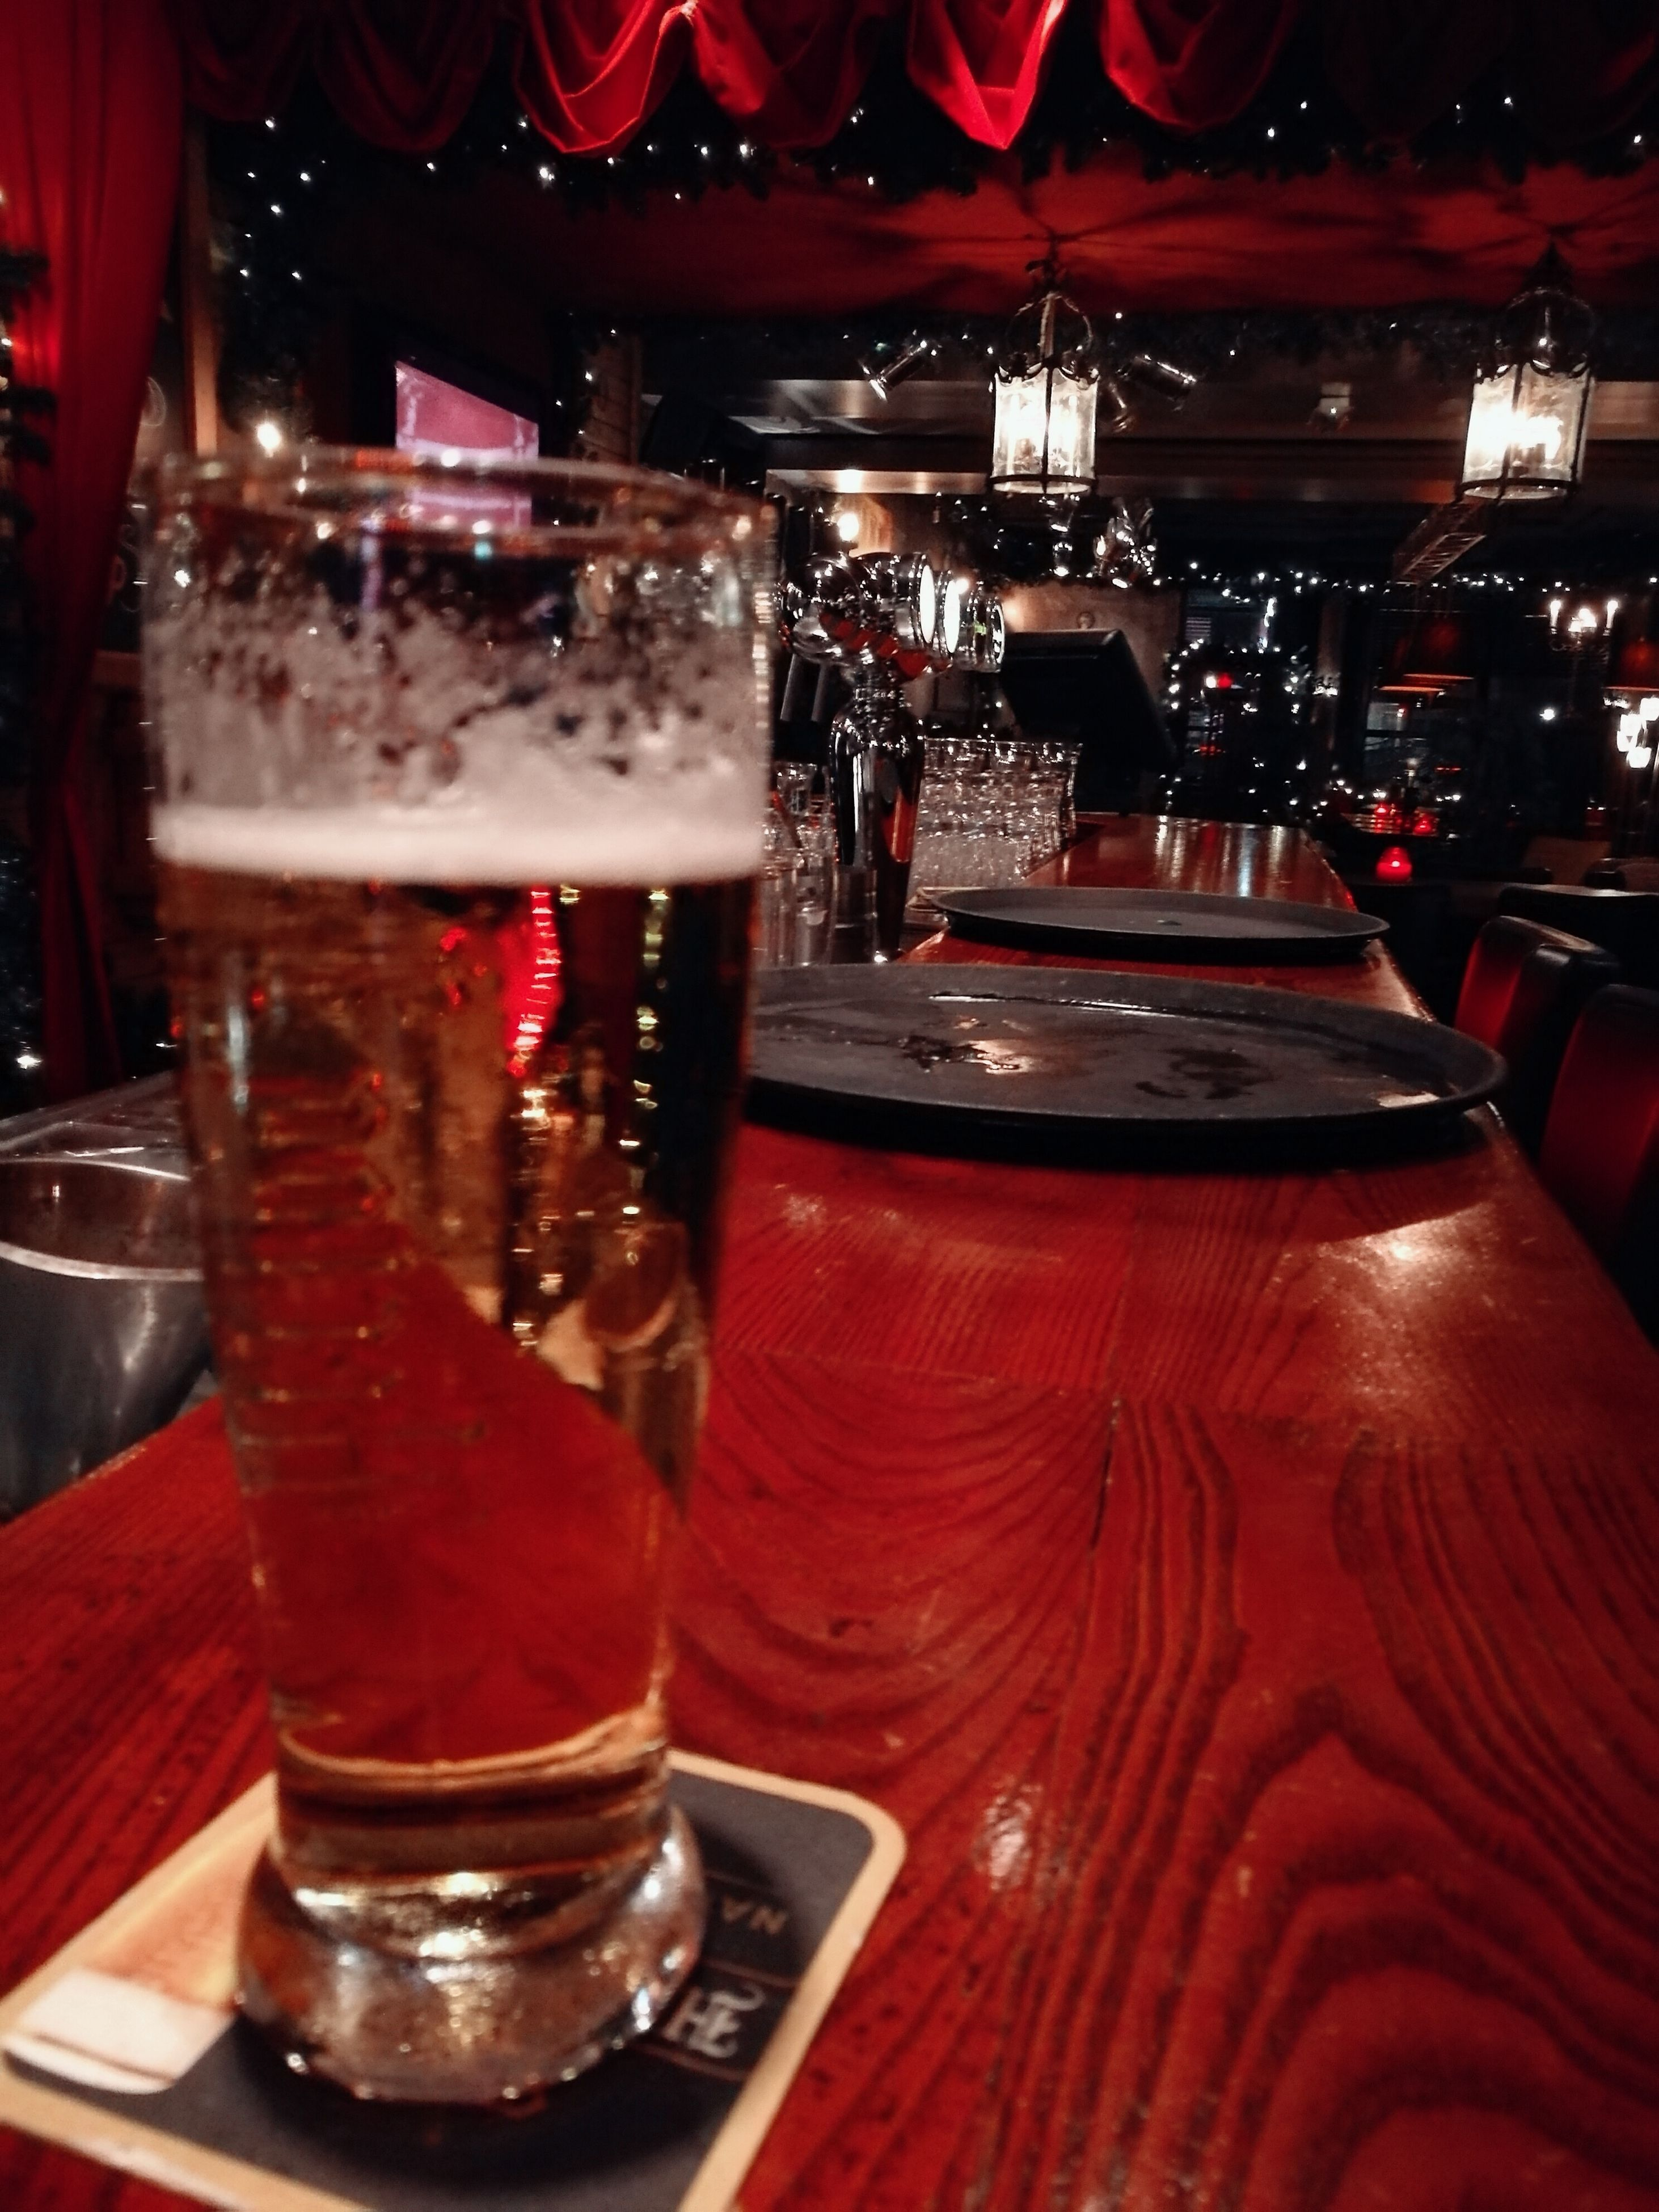 alcohol, drink, indoors, red, food and drink, table, bar - drink establishment, drinking glass, nightclub, nightlife, refreshment, illuminated, freshness, no people, wine, bar, night, hard liquor, wine rack